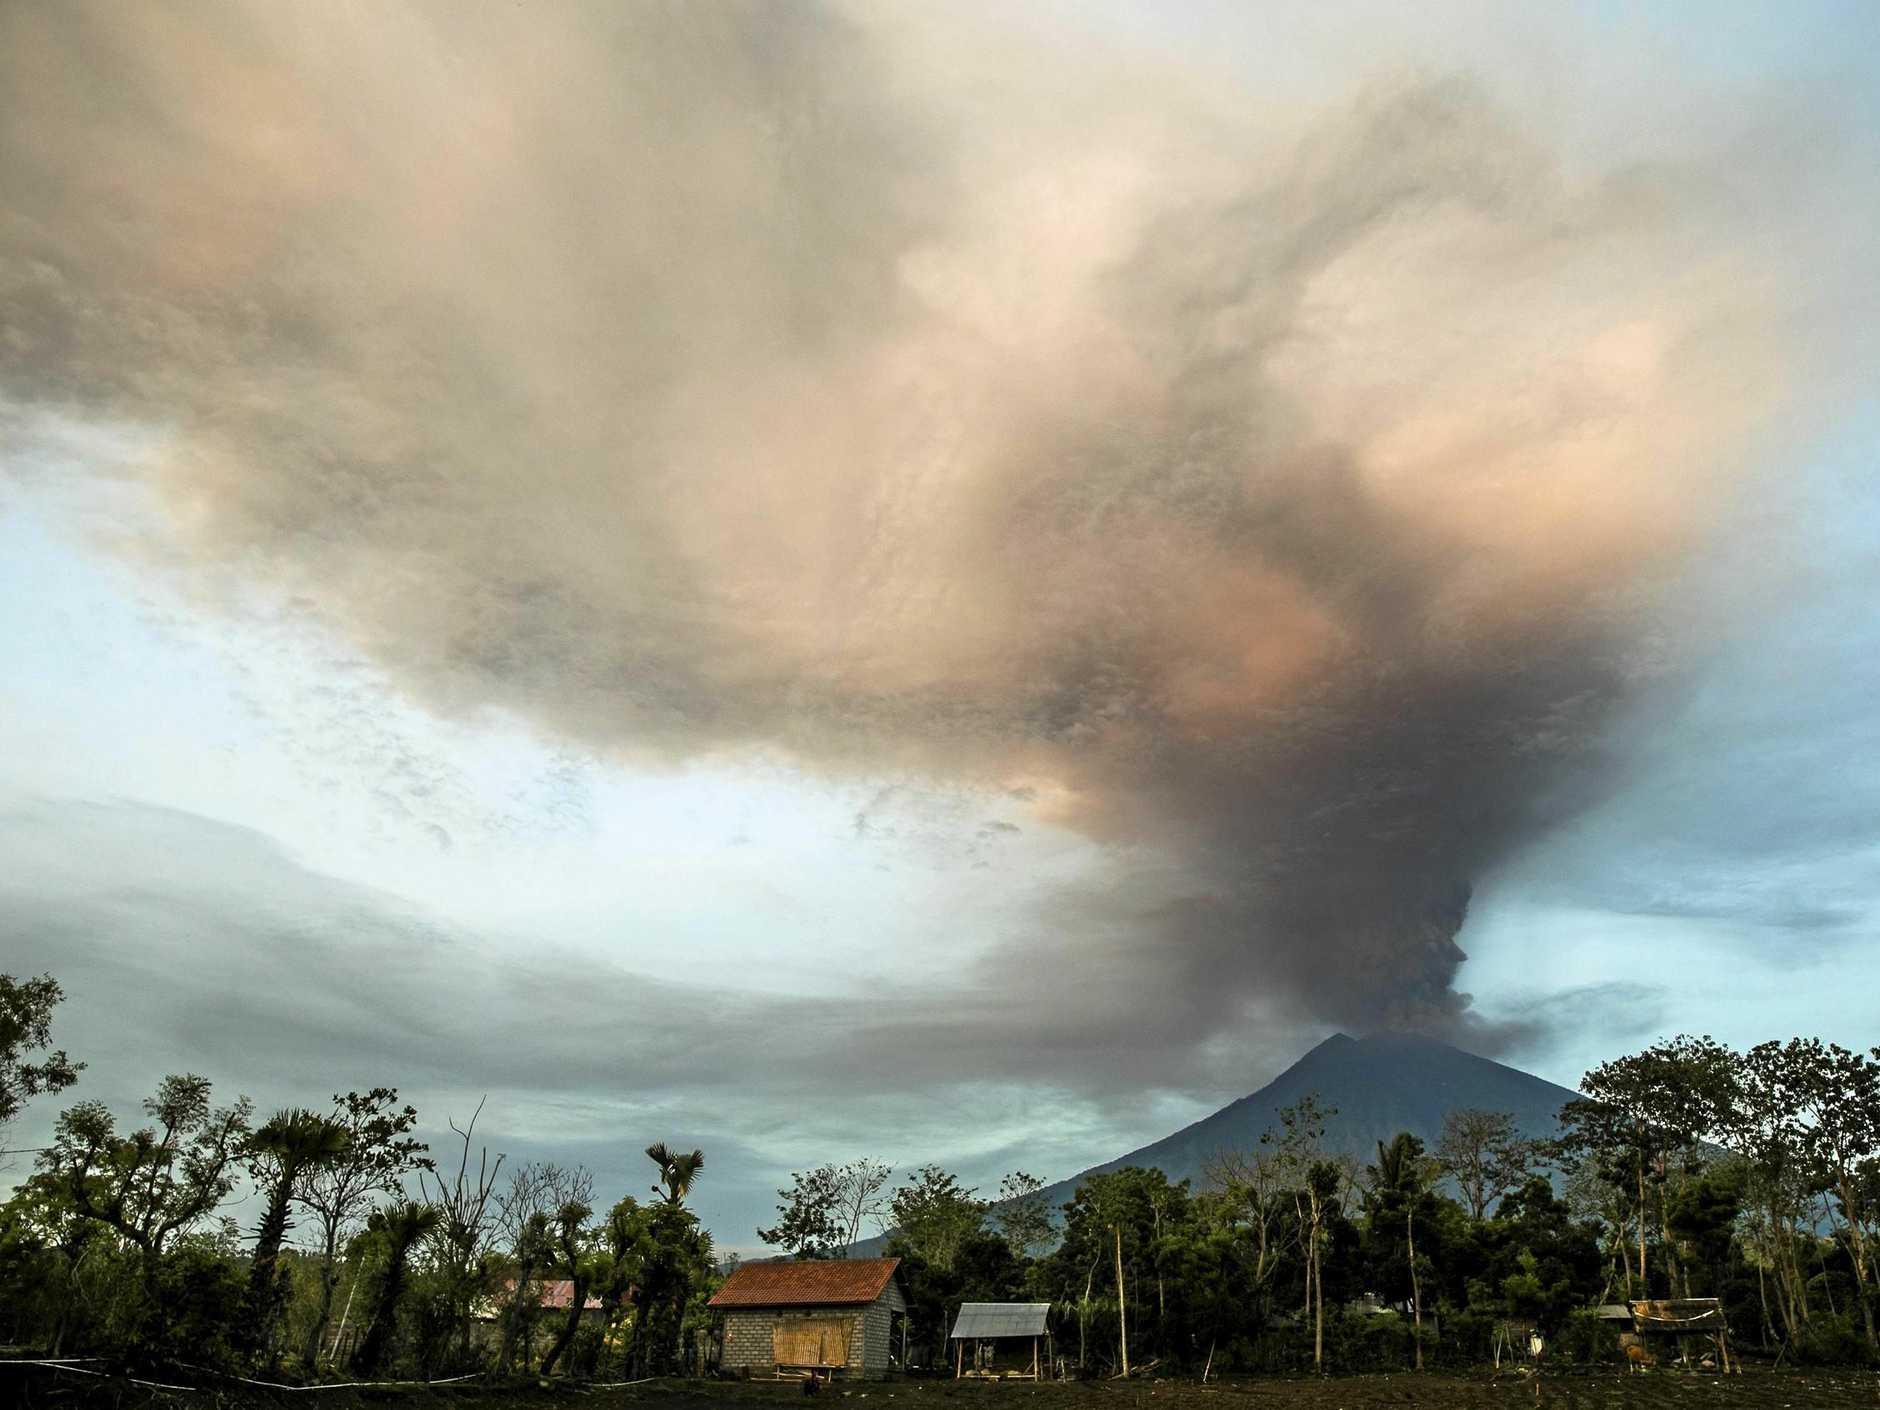 ERUPTING: The Mount Agung volcano spews hot volcanic ash, as seen from Datah, Karangasem, Bali, Indonesia